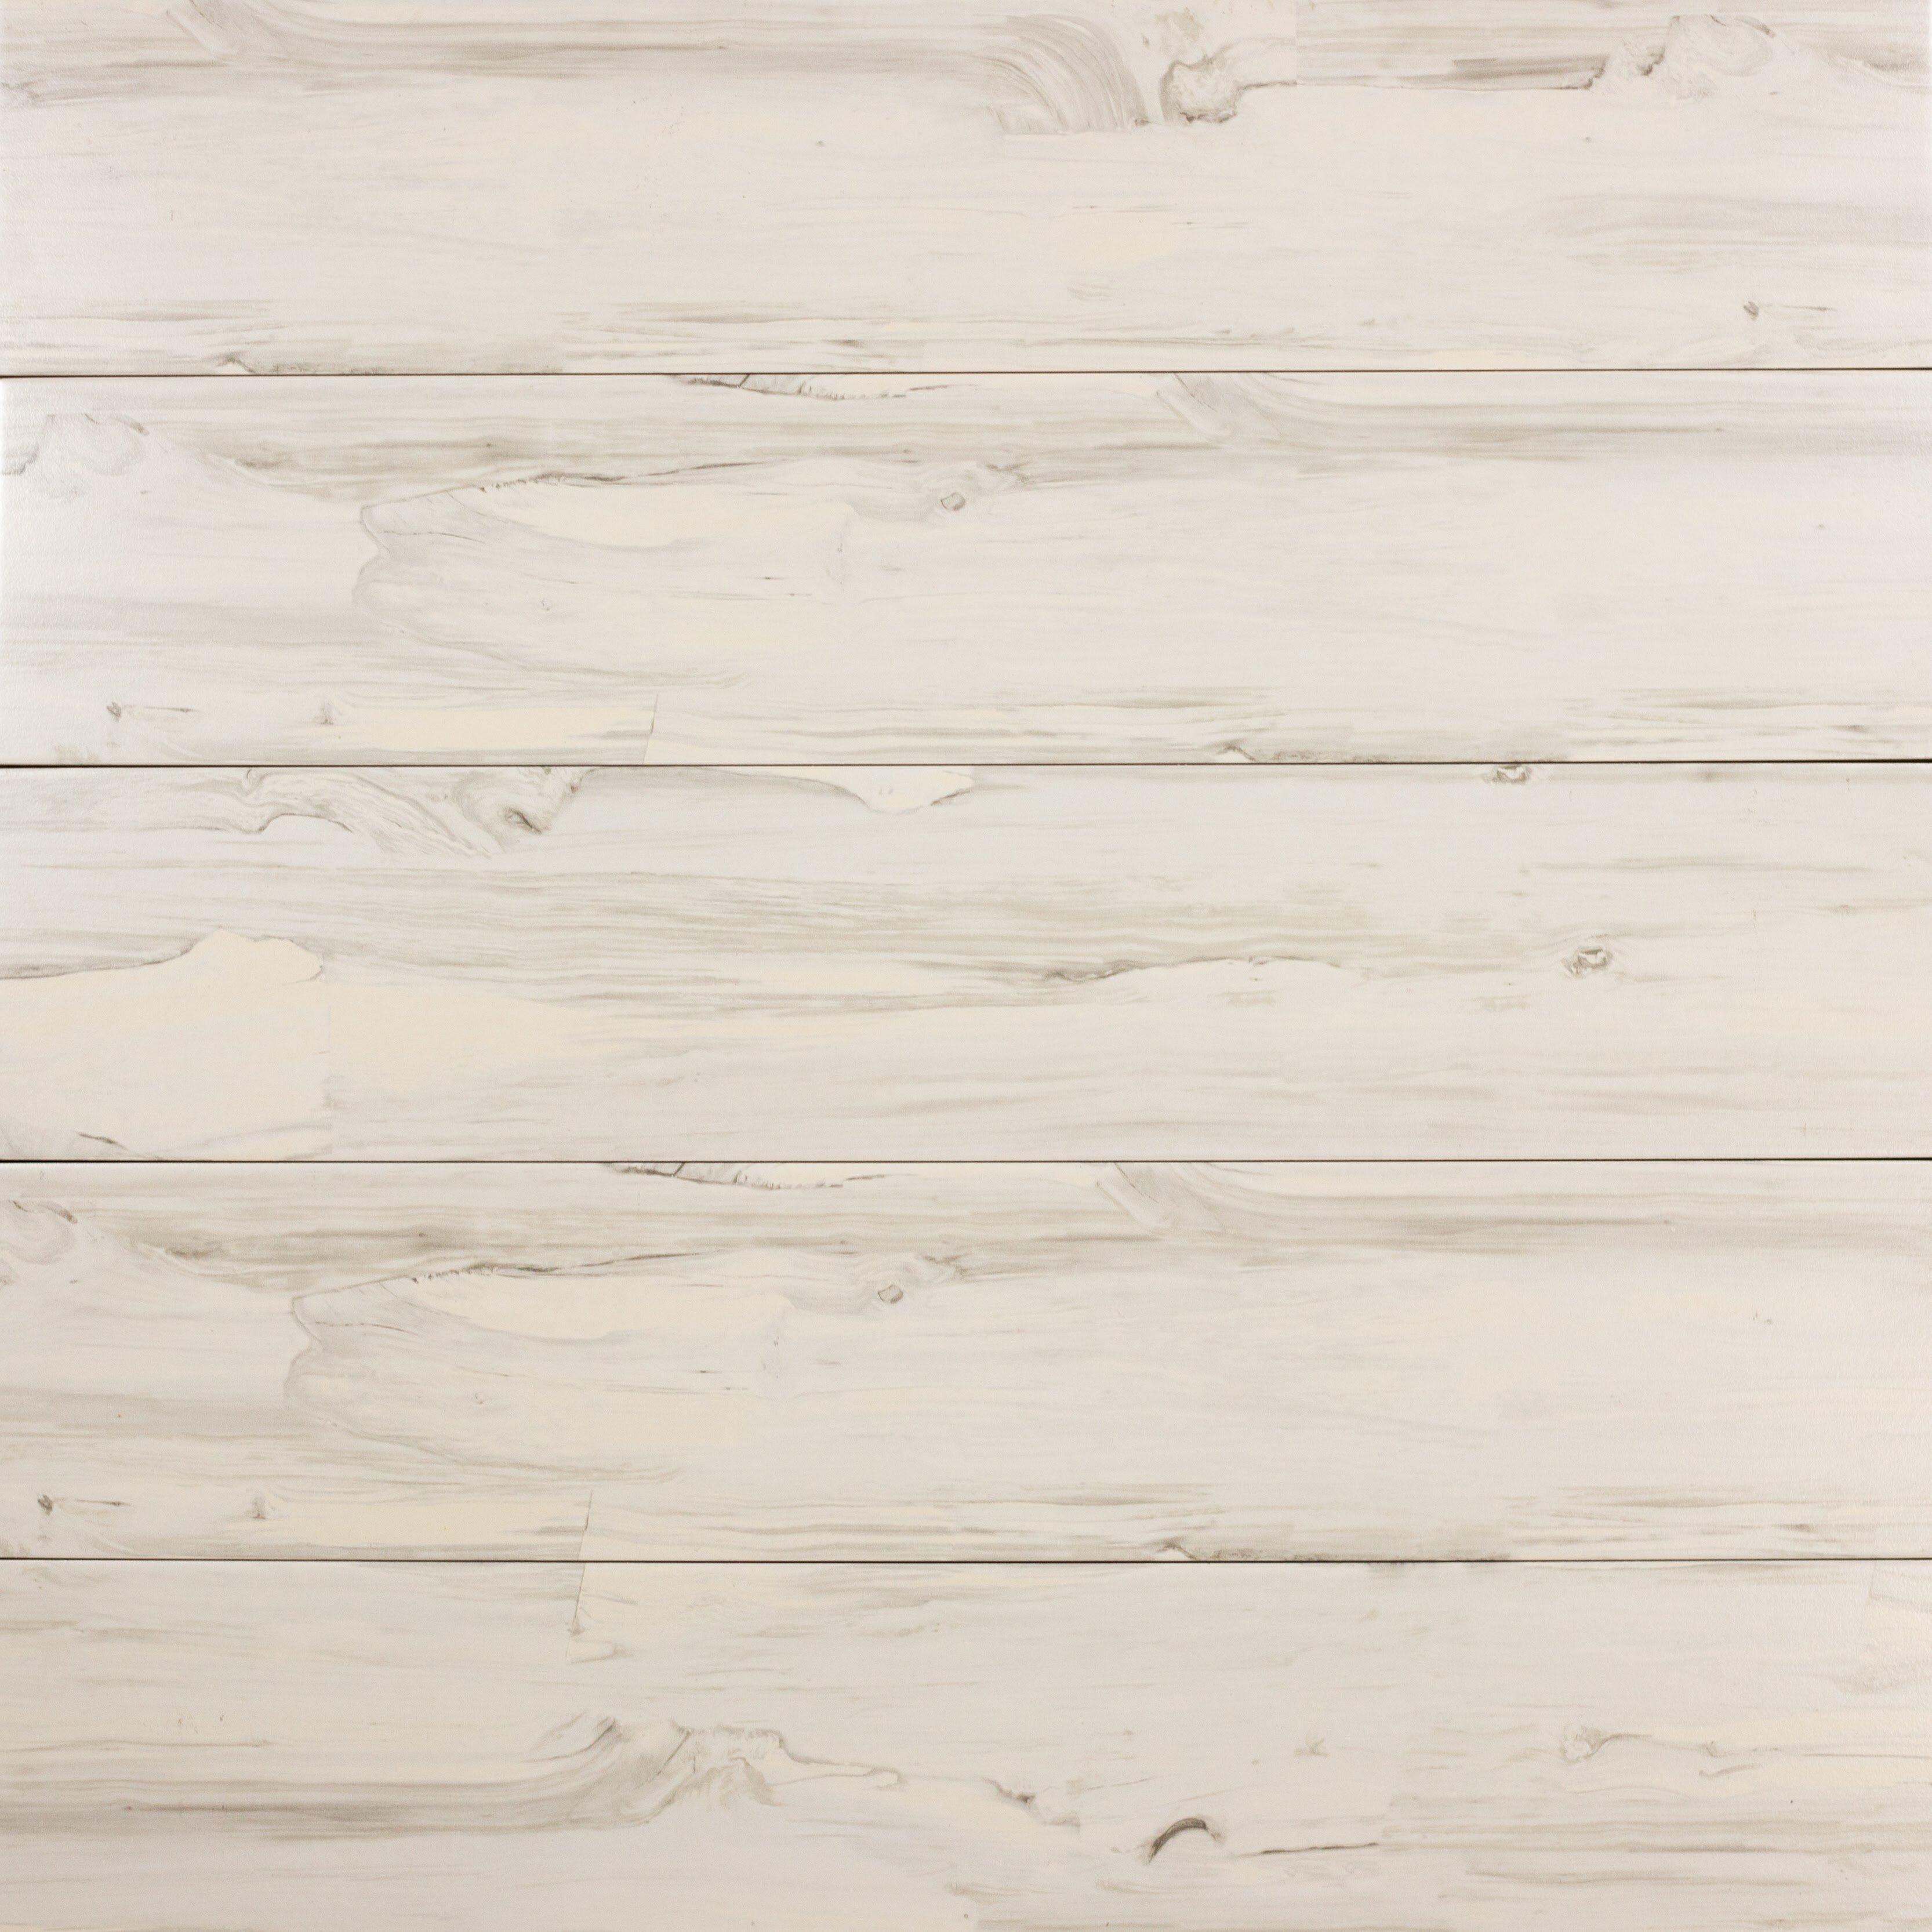 Abolos Artisan Wood 8 X 40 Ceramic Wood Look Tile In White Oak